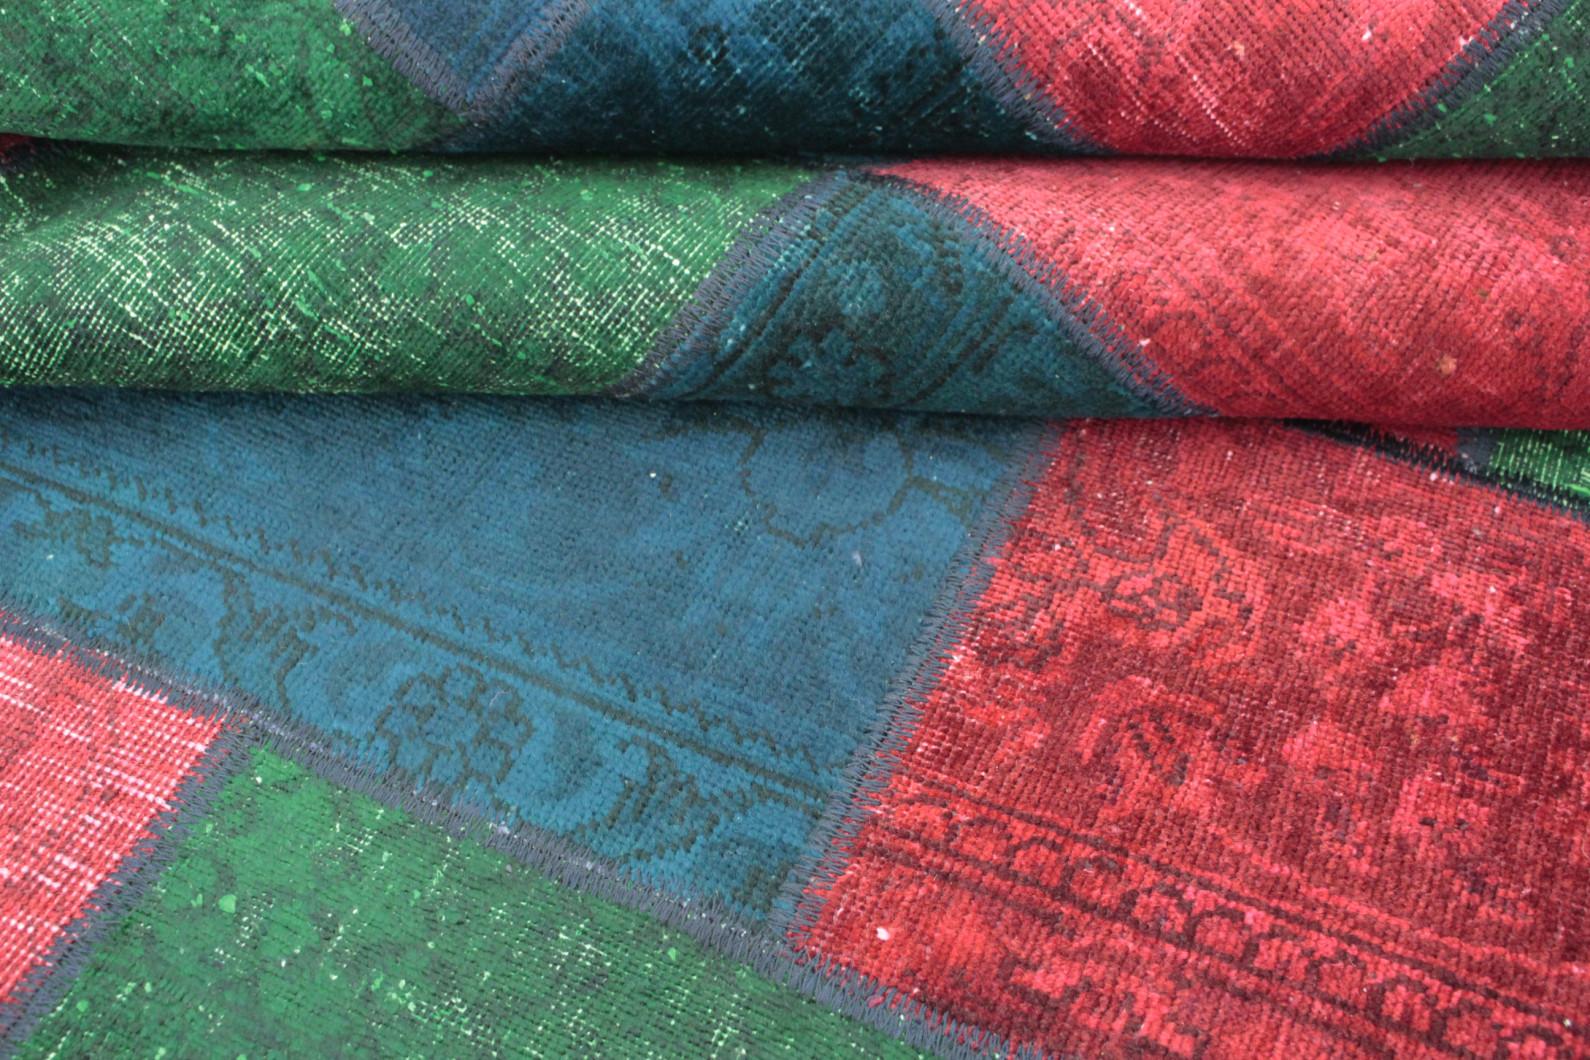 patchwork teppich rot gr n blau in 240x170 1001 167121. Black Bedroom Furniture Sets. Home Design Ideas